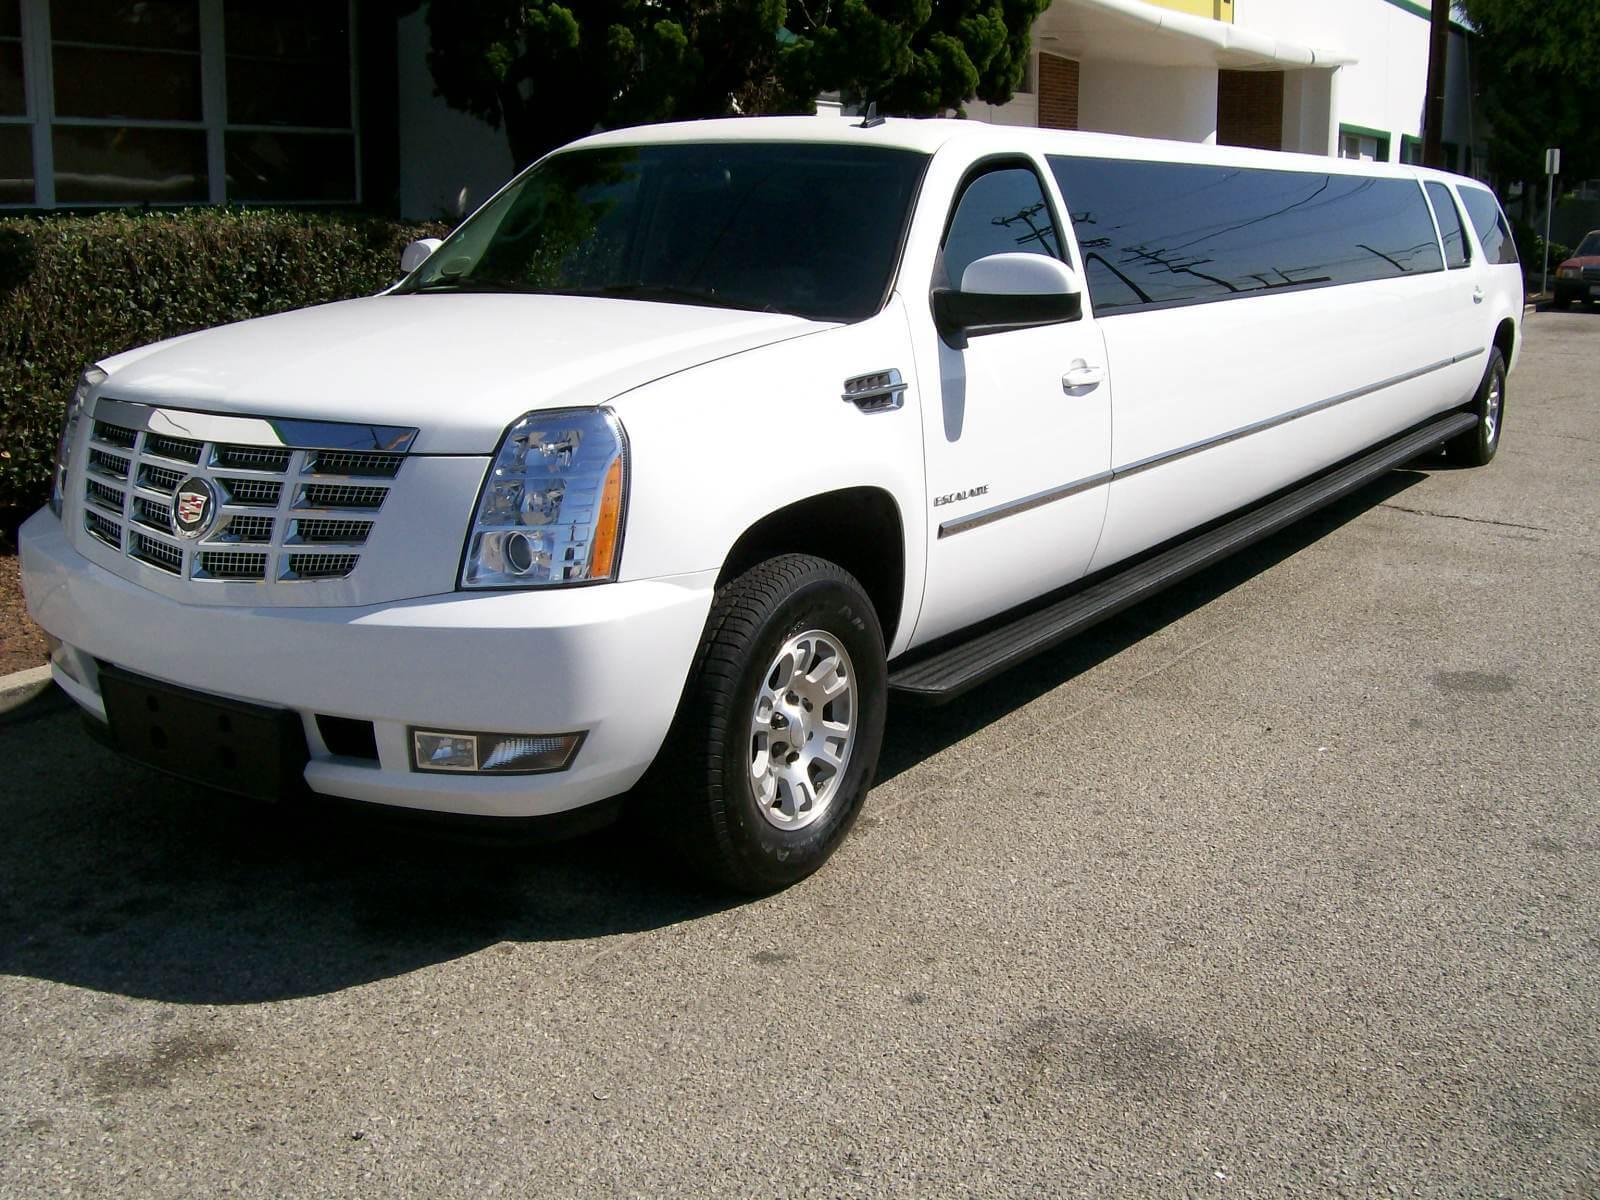 Los Angeles Limo Service White Escalade Limousine Rental